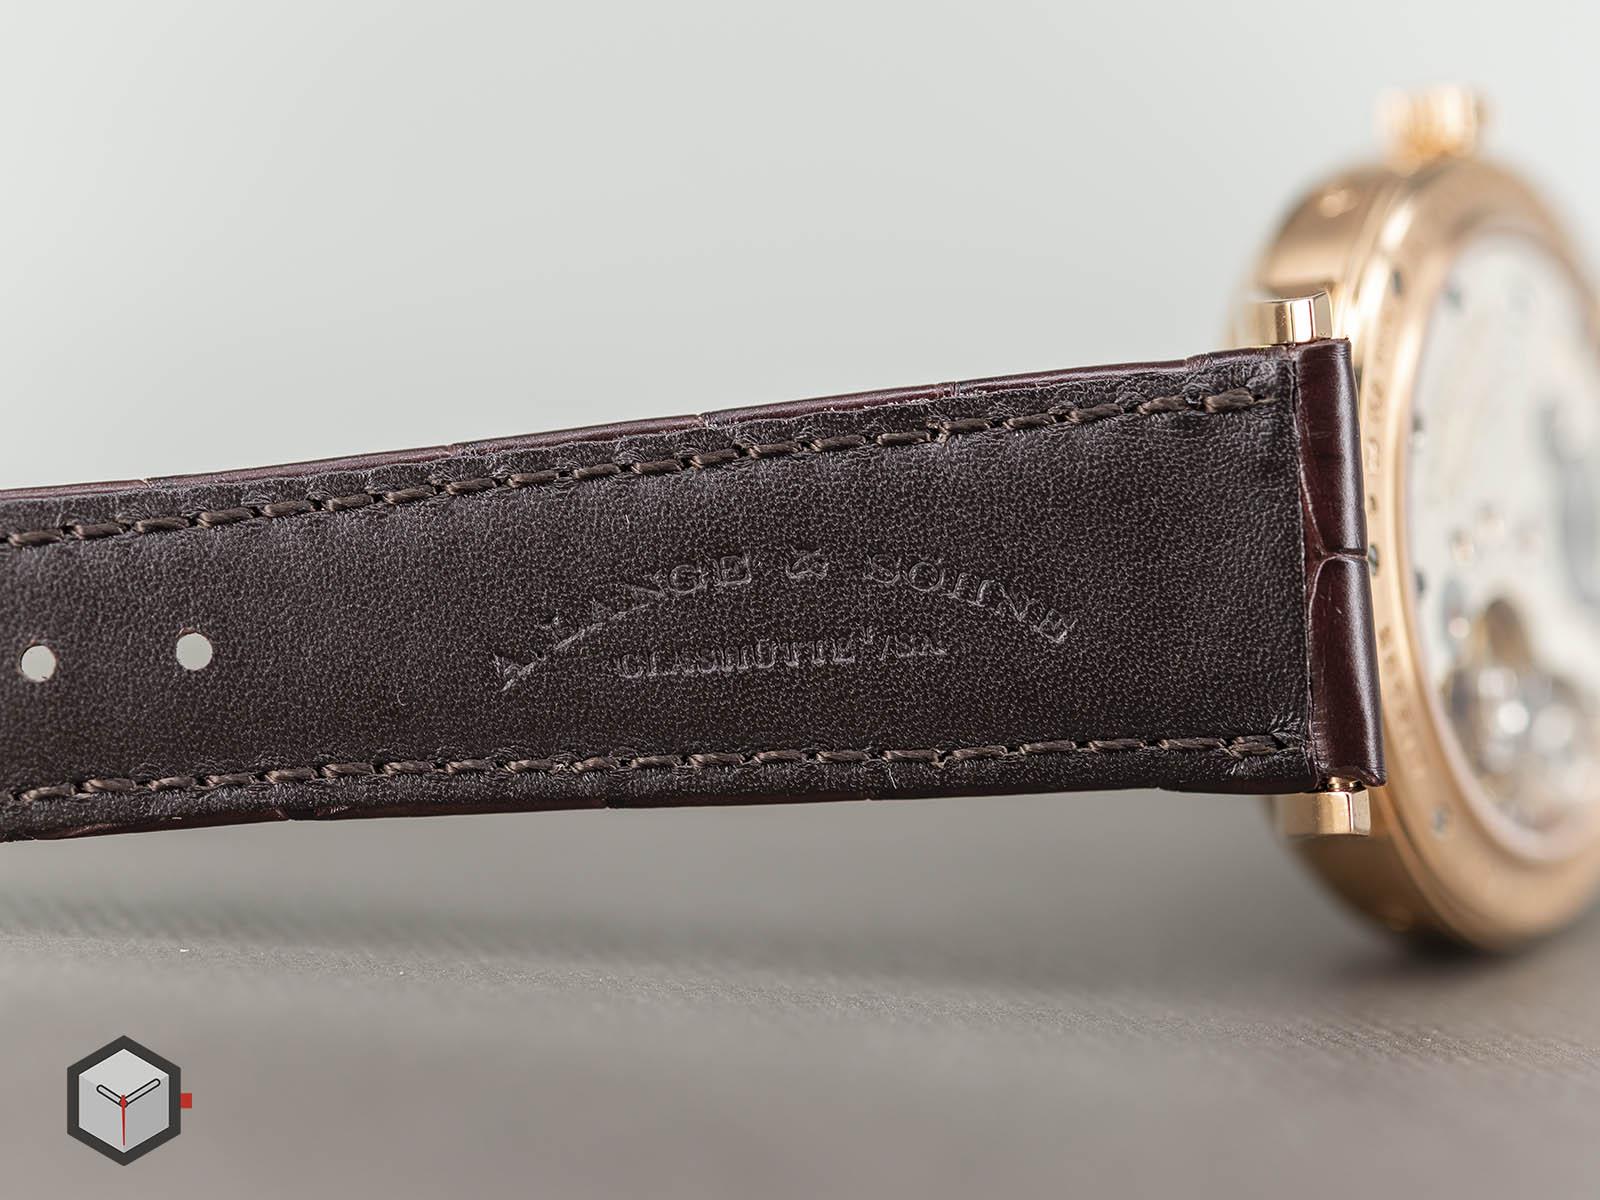 238-032-a-lange-sohne-1815-annual-calendar-18k-pink-gold-9.jpg